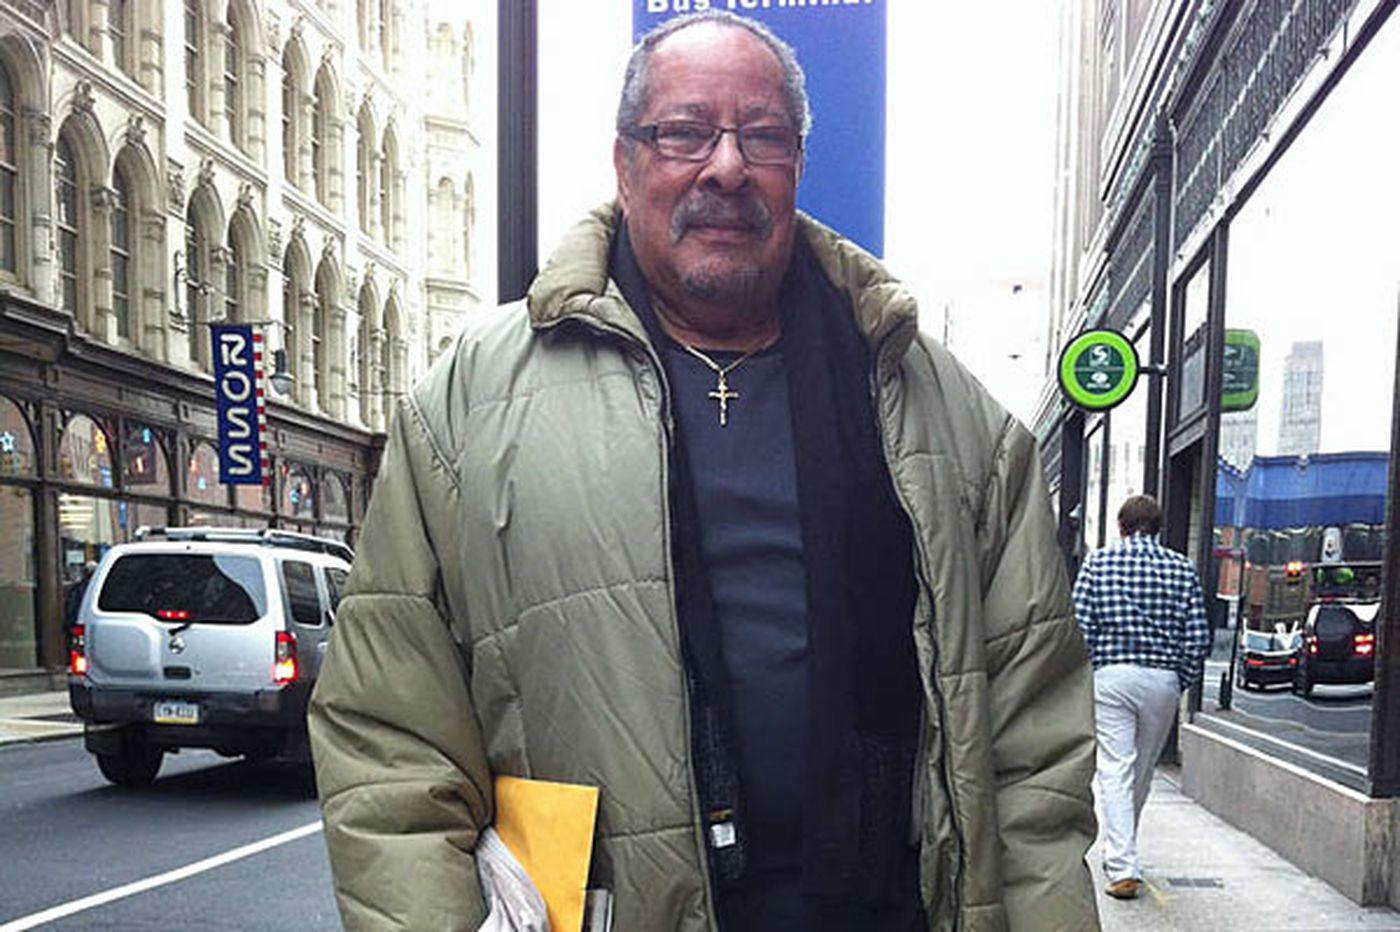 Ronnie Polaneczky: ABSURDIST COMEDY: WAITING FOR THE DOUGH